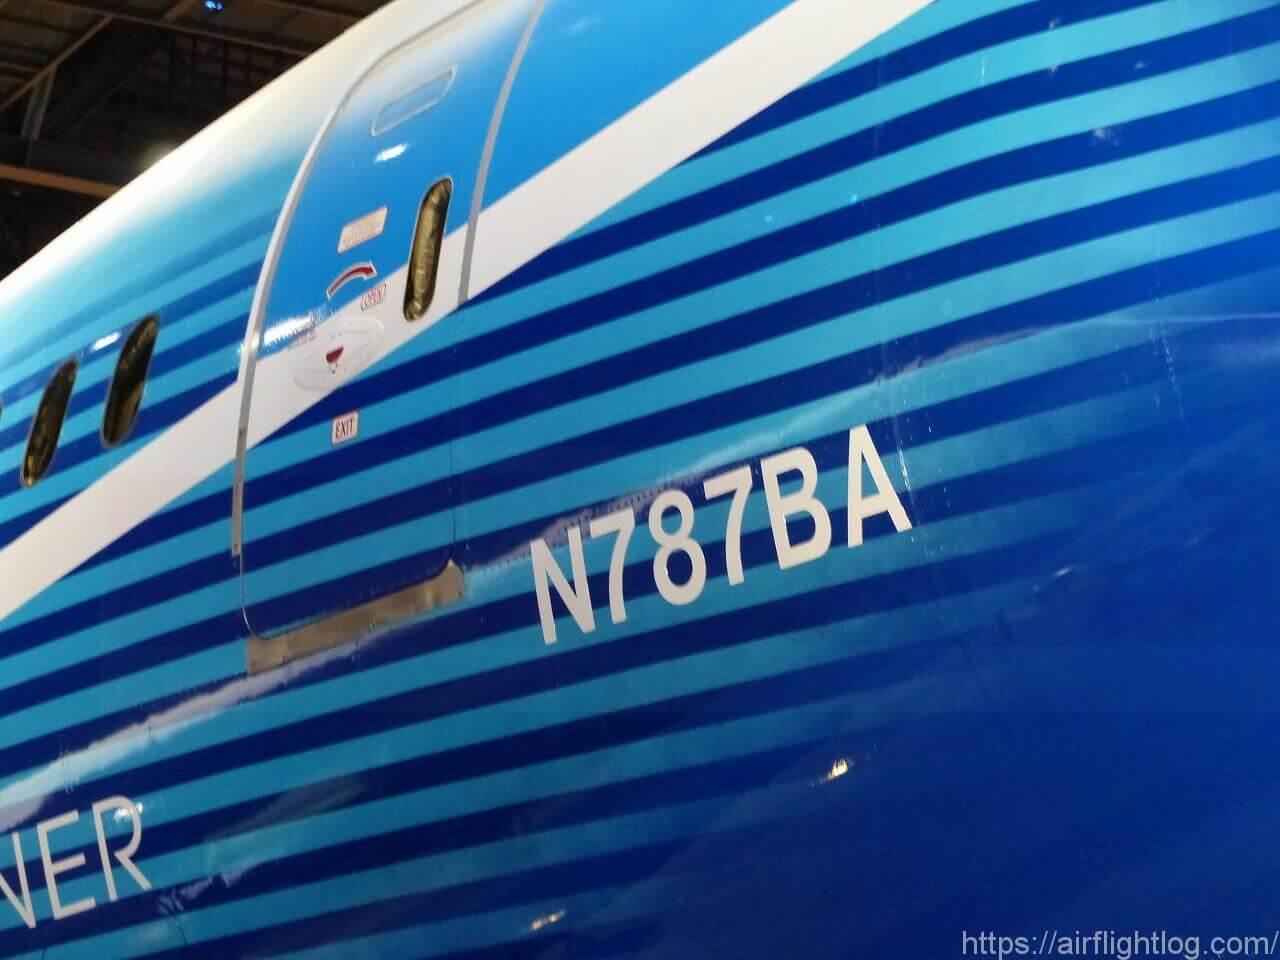 「FLIGHT OF DREAMS(フライト・オブ・ドリームズ)」ボーイング787初号機機体番号